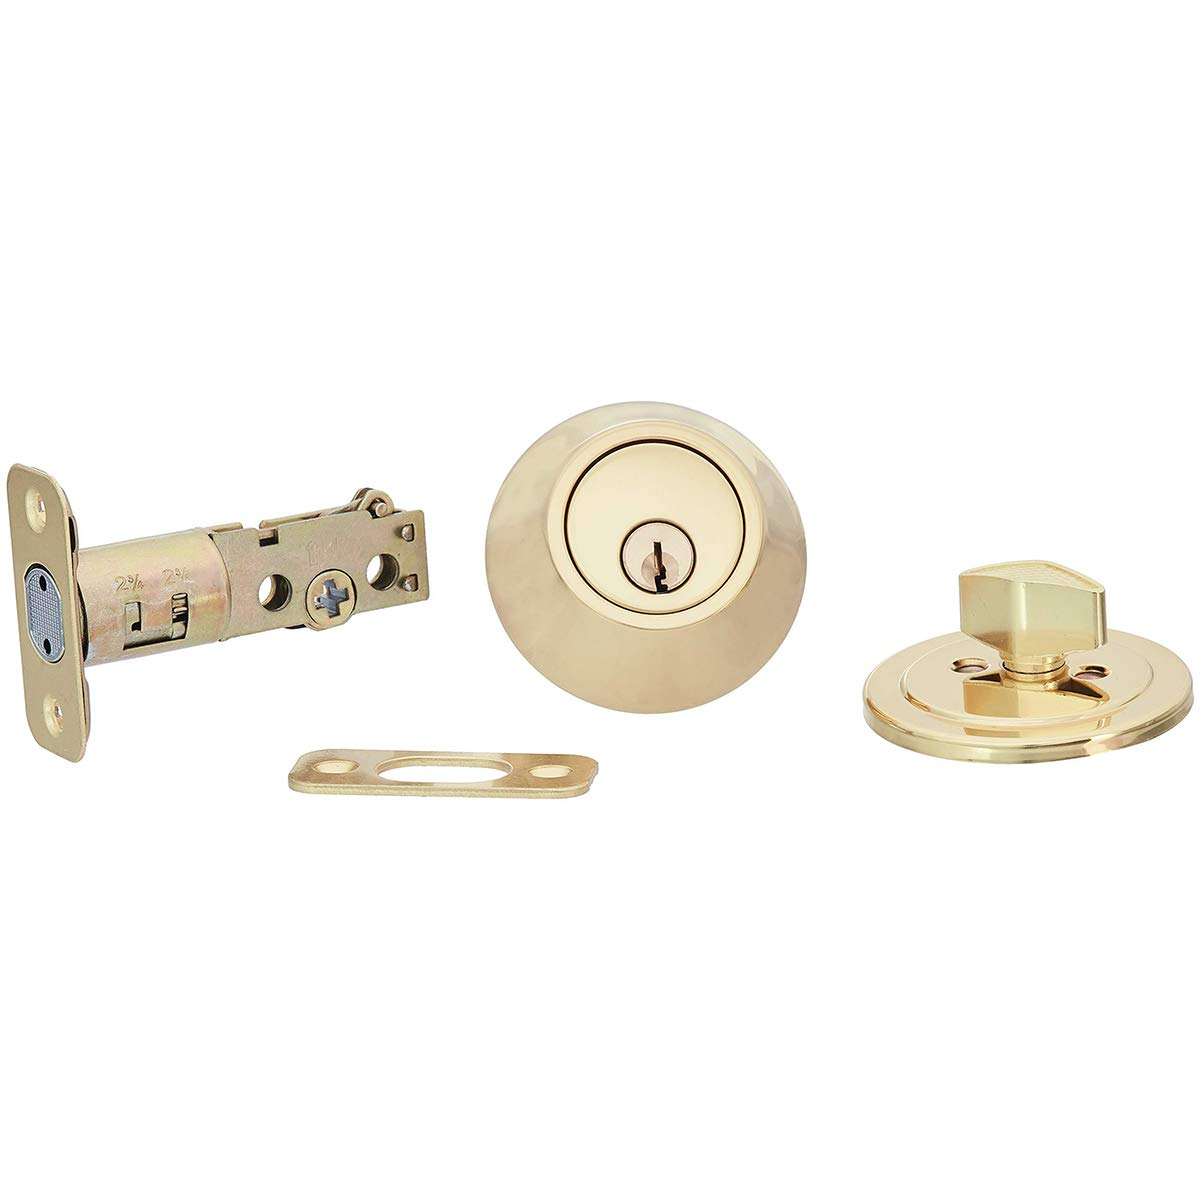 AmazonBasics Entry Knob and Deadbolt - Classic - Polished Brass – 2-Pack by AmazonBasics (Image #3)